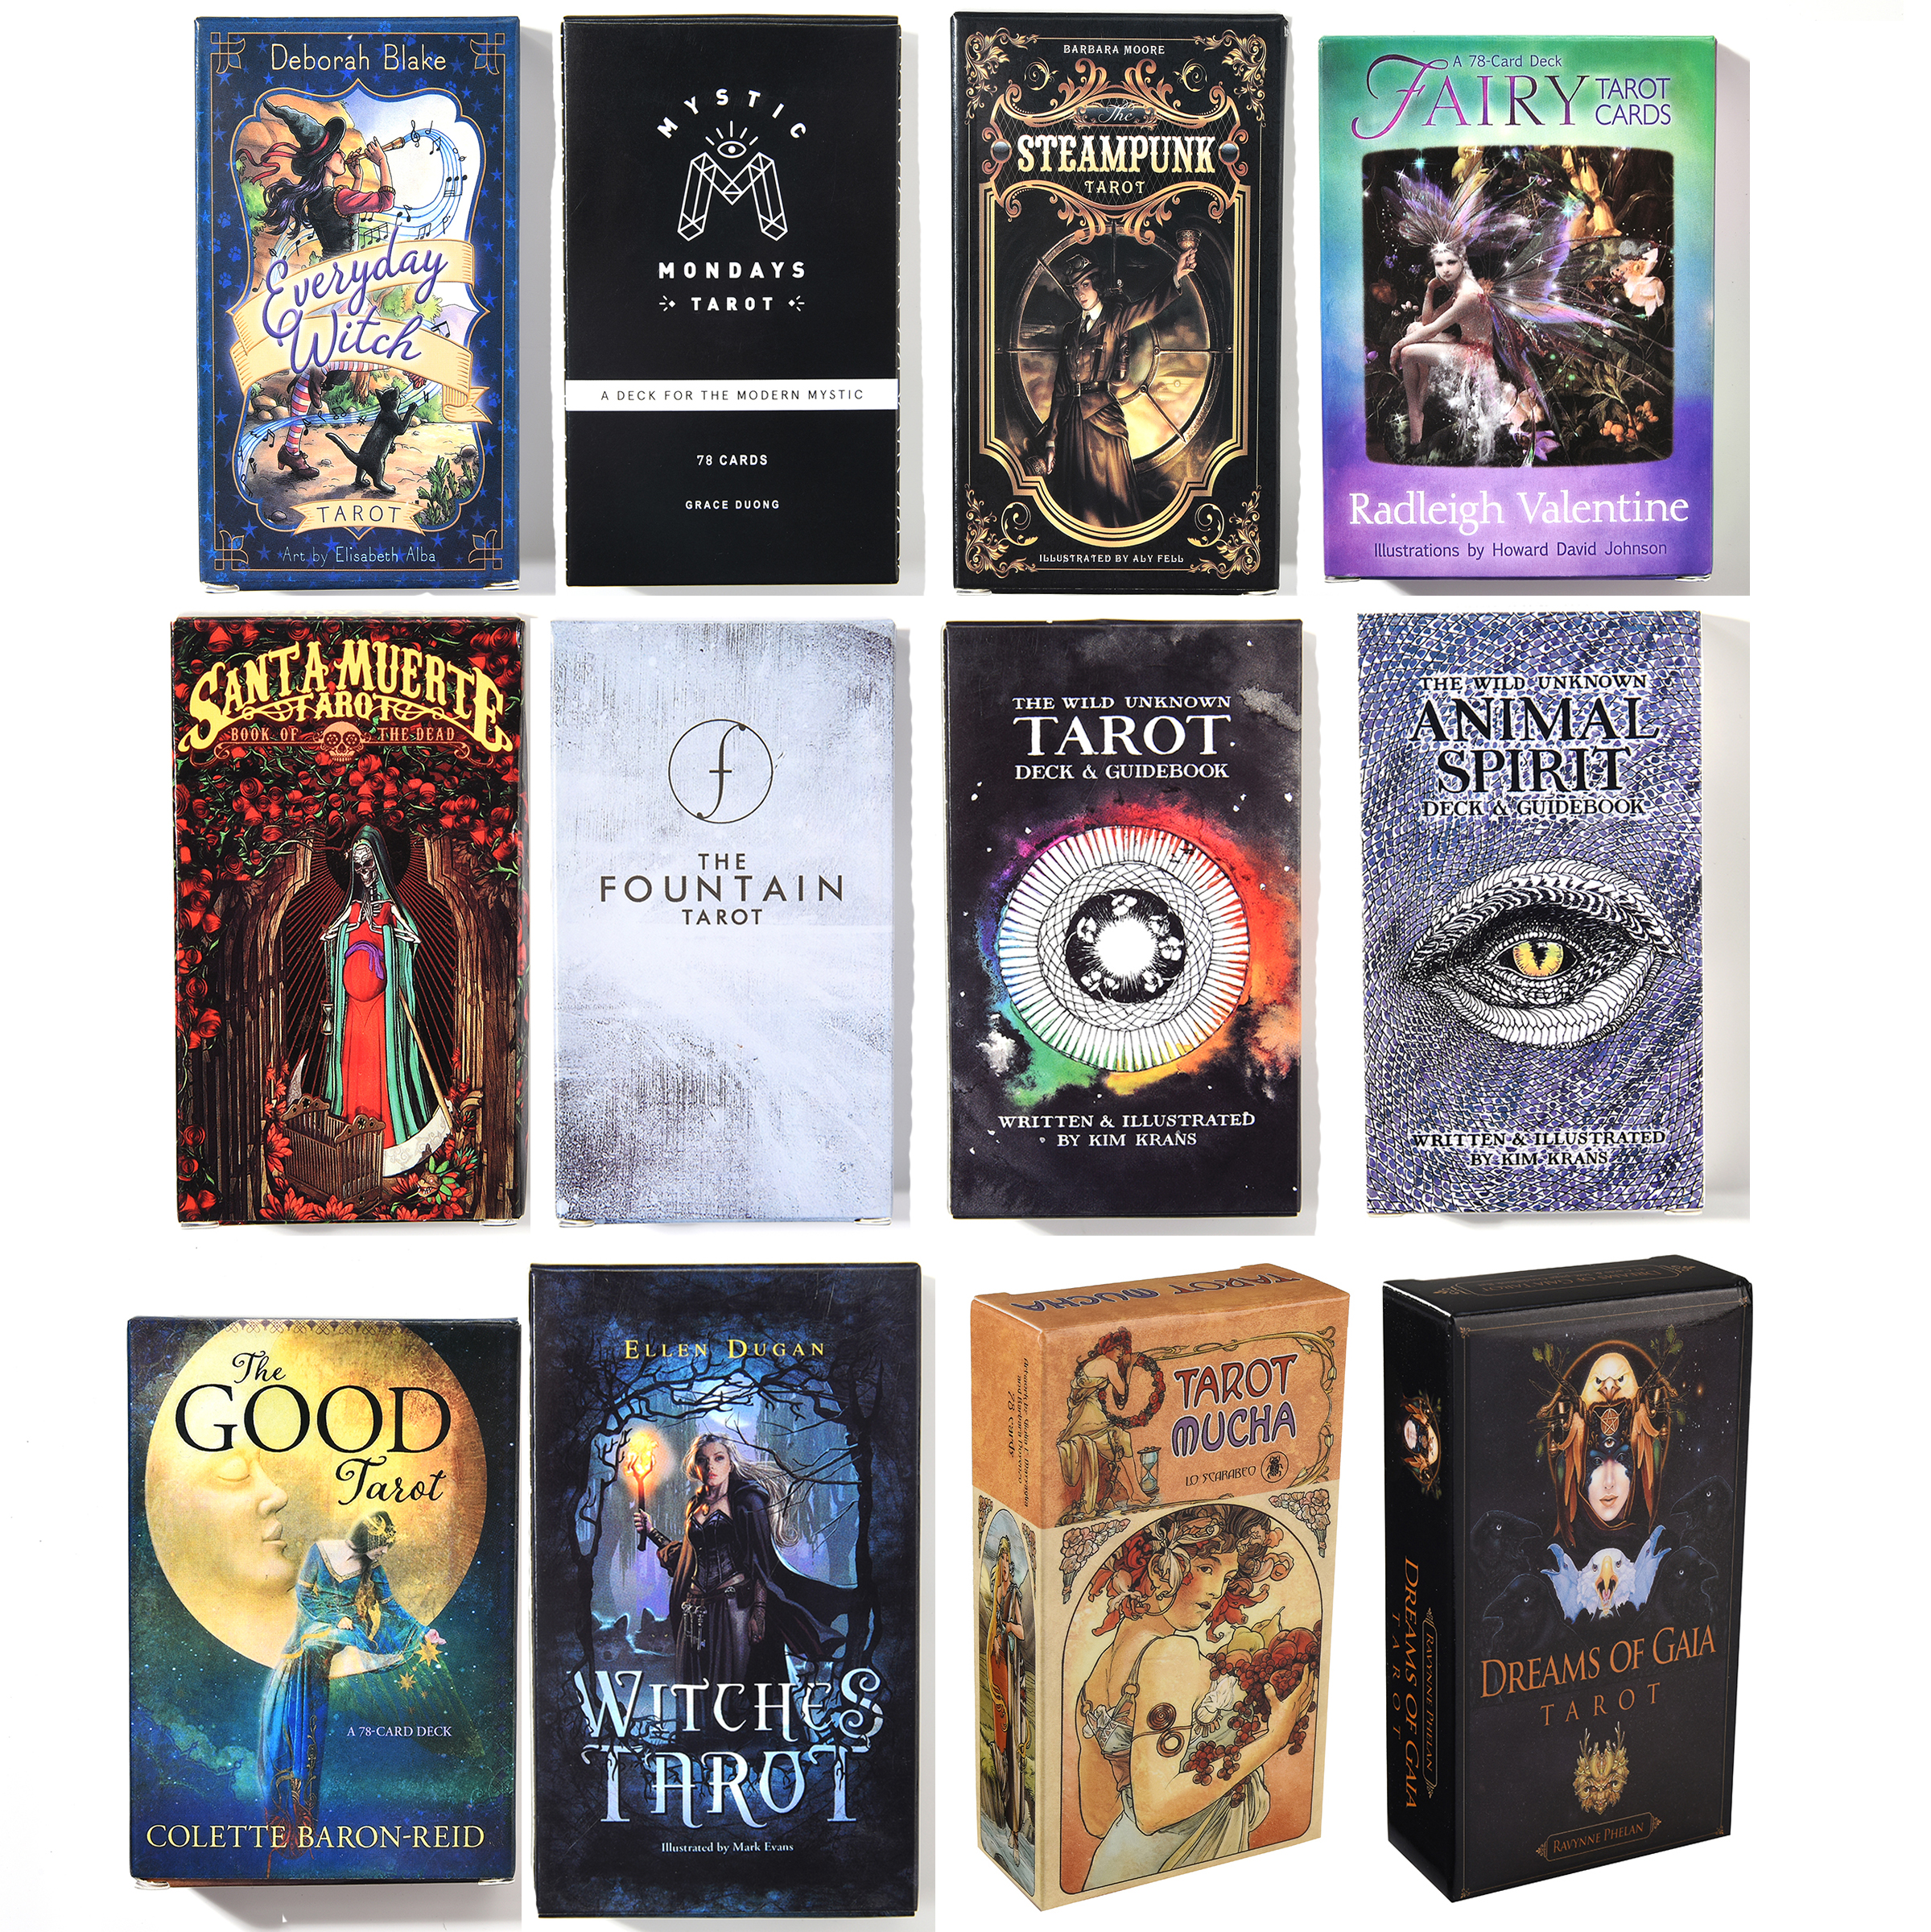 Everyday Witch Mystic Mondays Tarot Steampunk Fairy Good Animal Spirit Deck Fountain Santa Muerte Witches Mucha Card Game